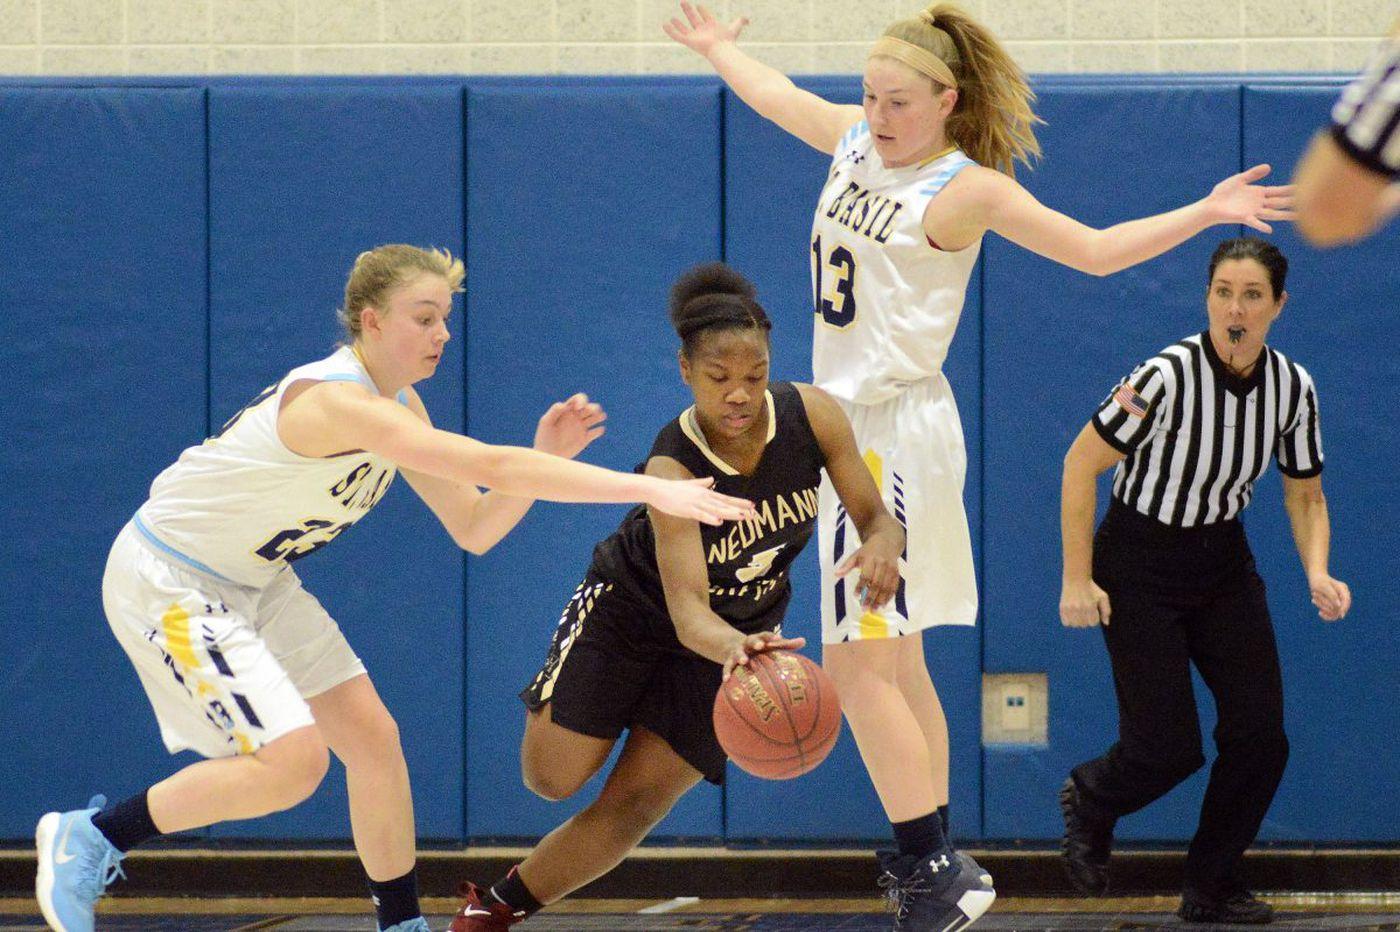 Neumann-Goretti girls shoot for fourth straight state basketball title